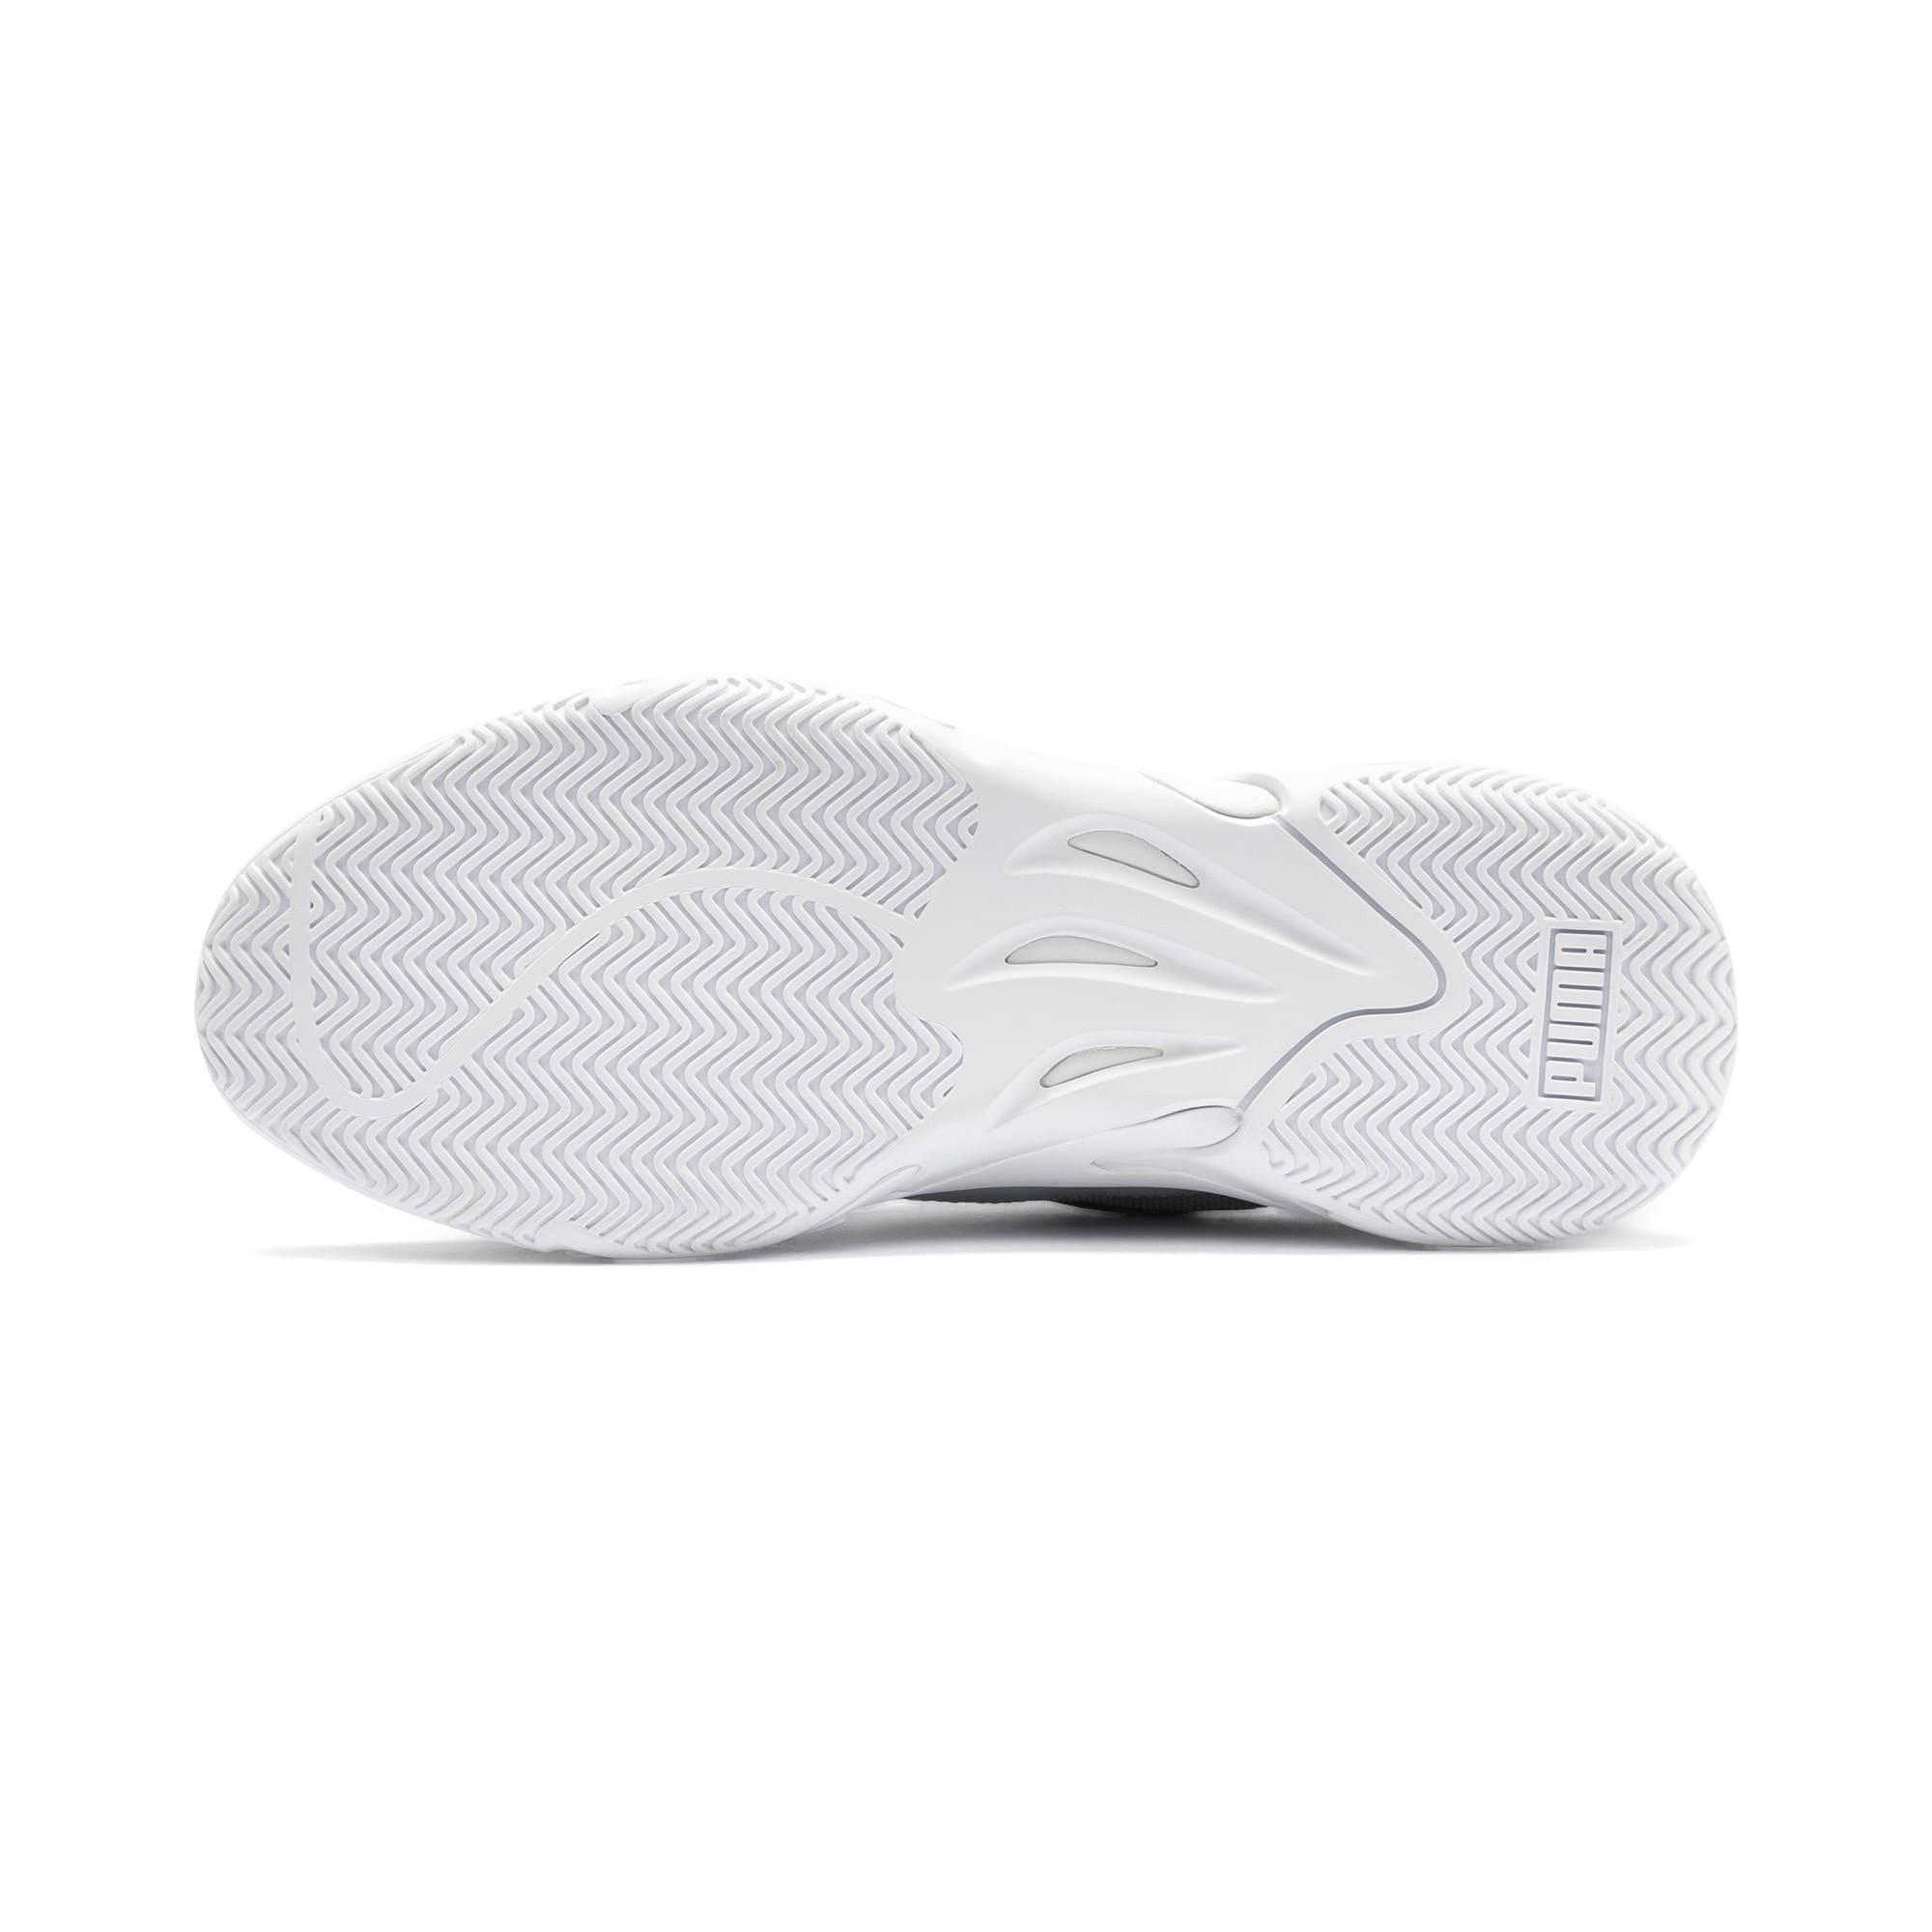 Miniatura 5 de Zapatos deportivos Storm Pulse, High Rise, mediano